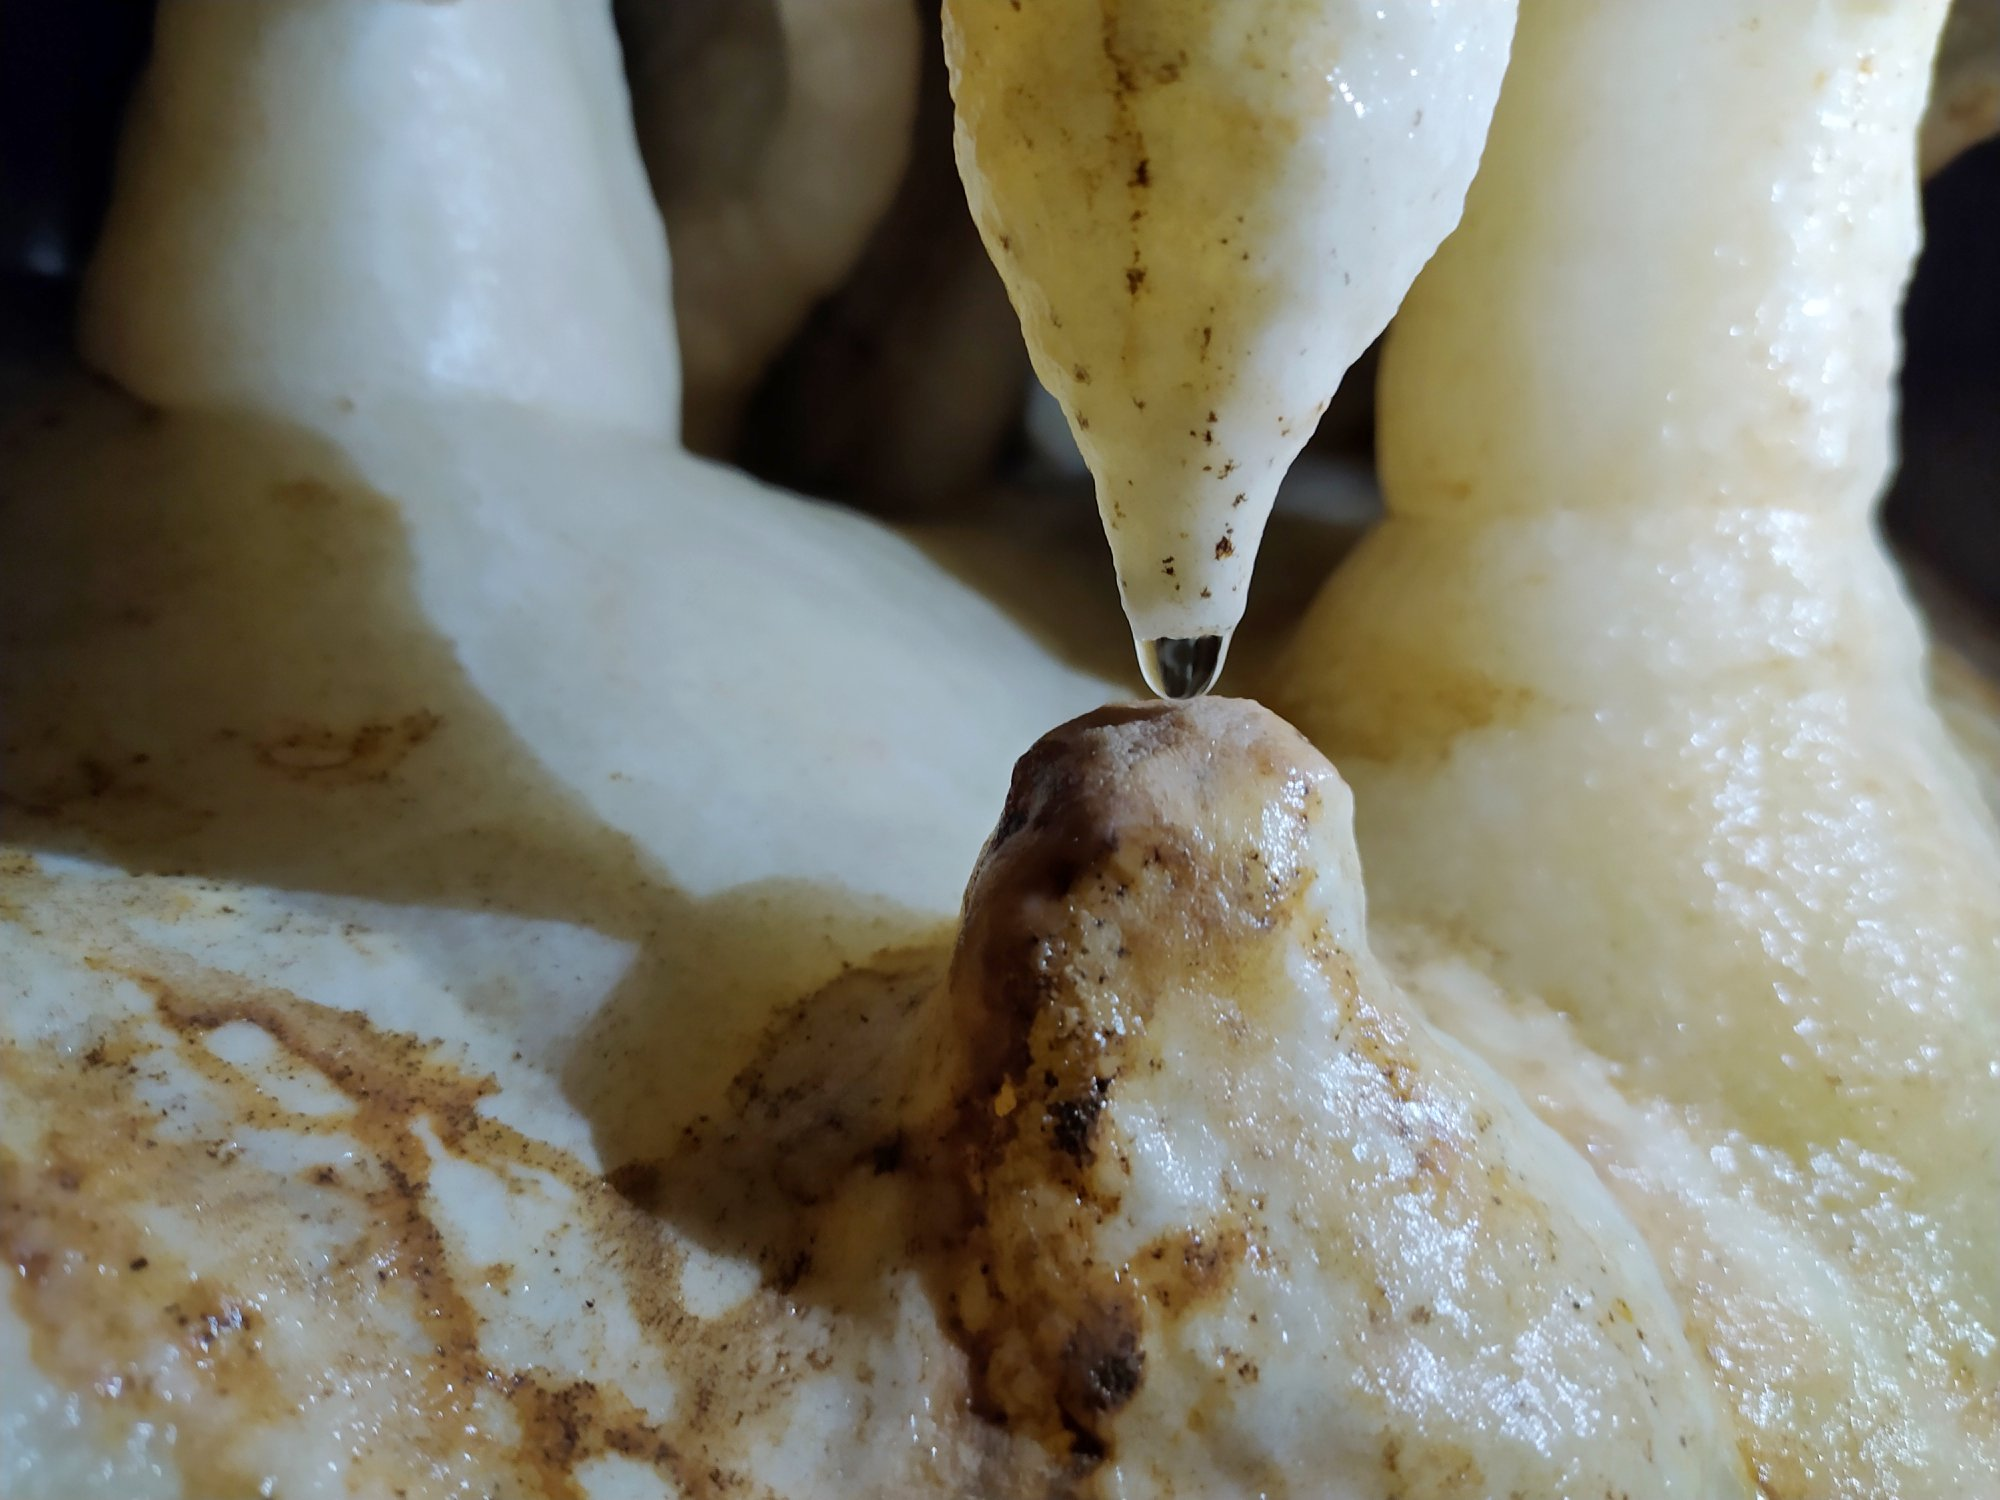 carsismo-stalattite-stalagmite